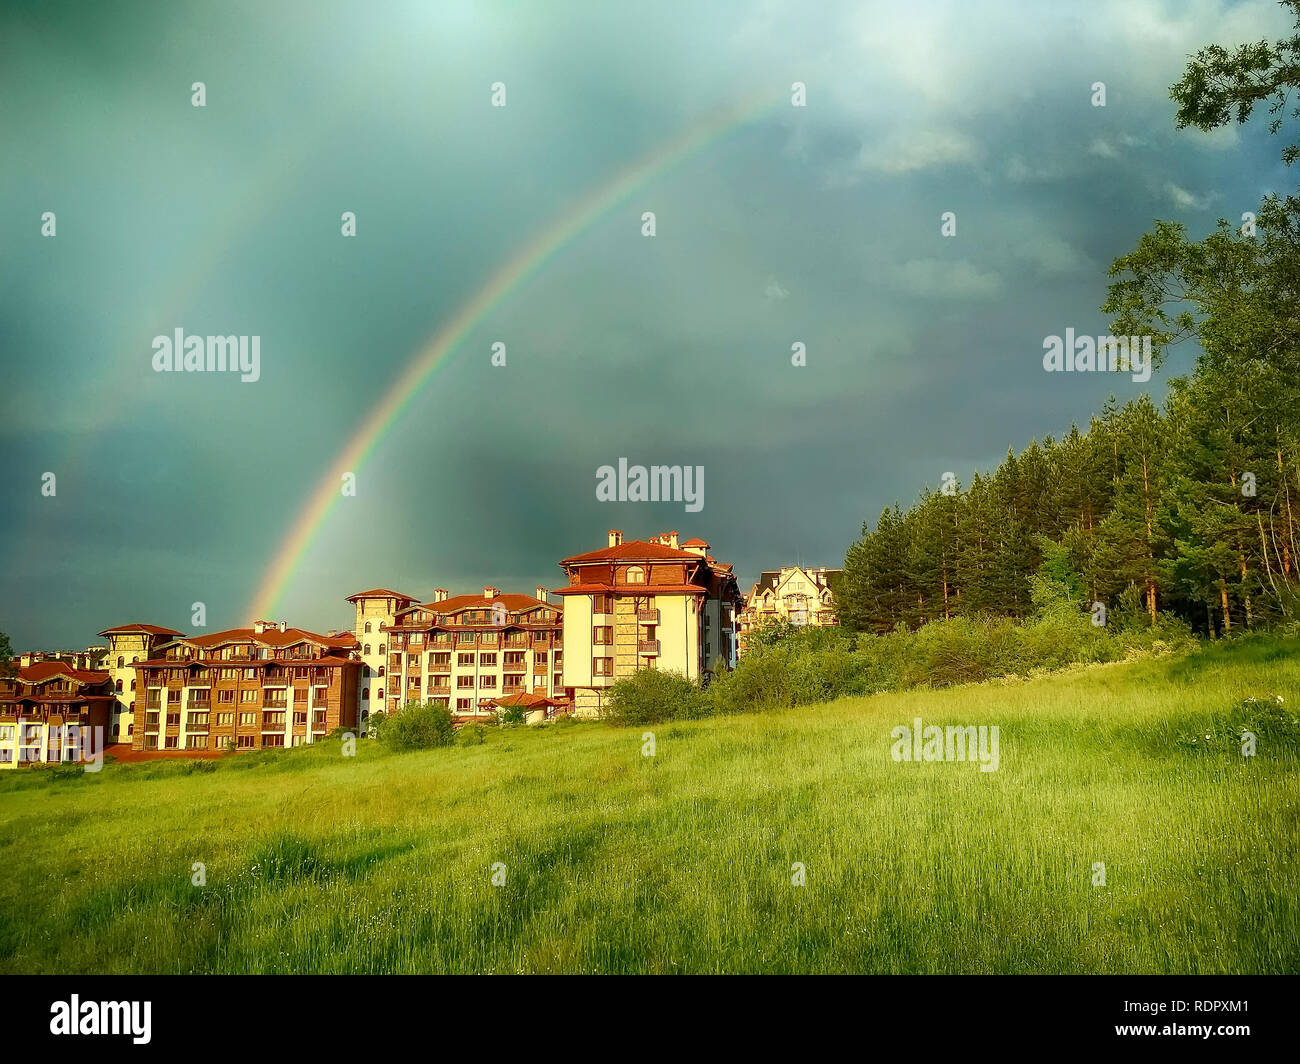 Summer town panorama of bulgarian all seasons resort Bansko, Bulgaria with wooden houses and rainbow - Stock Image